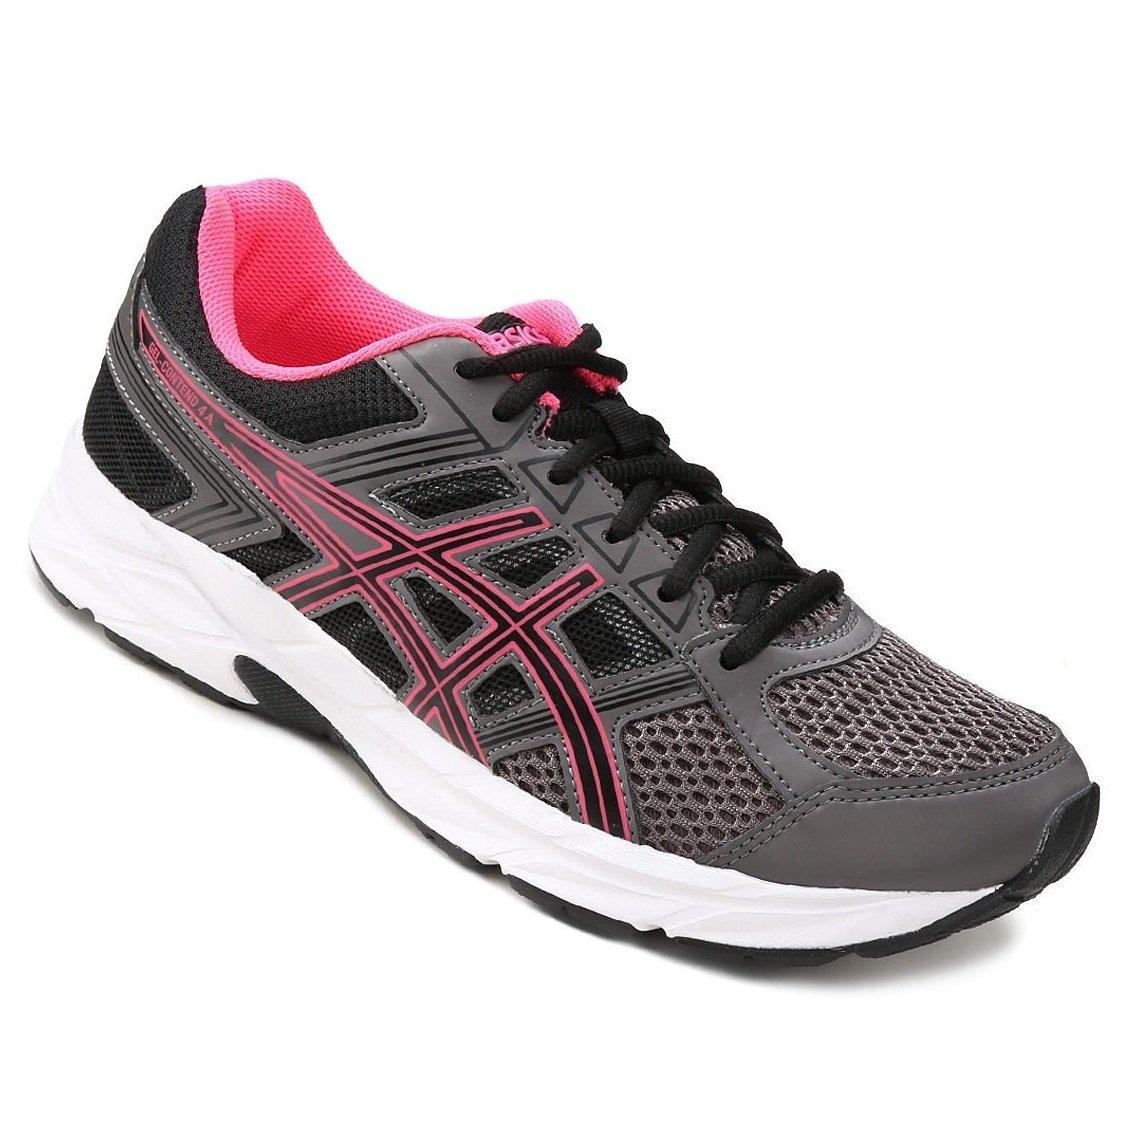 Tênis Feminino Asics Gel-Contend 4 A T076A-9490 Chumbo Pink e8745f6e9af50